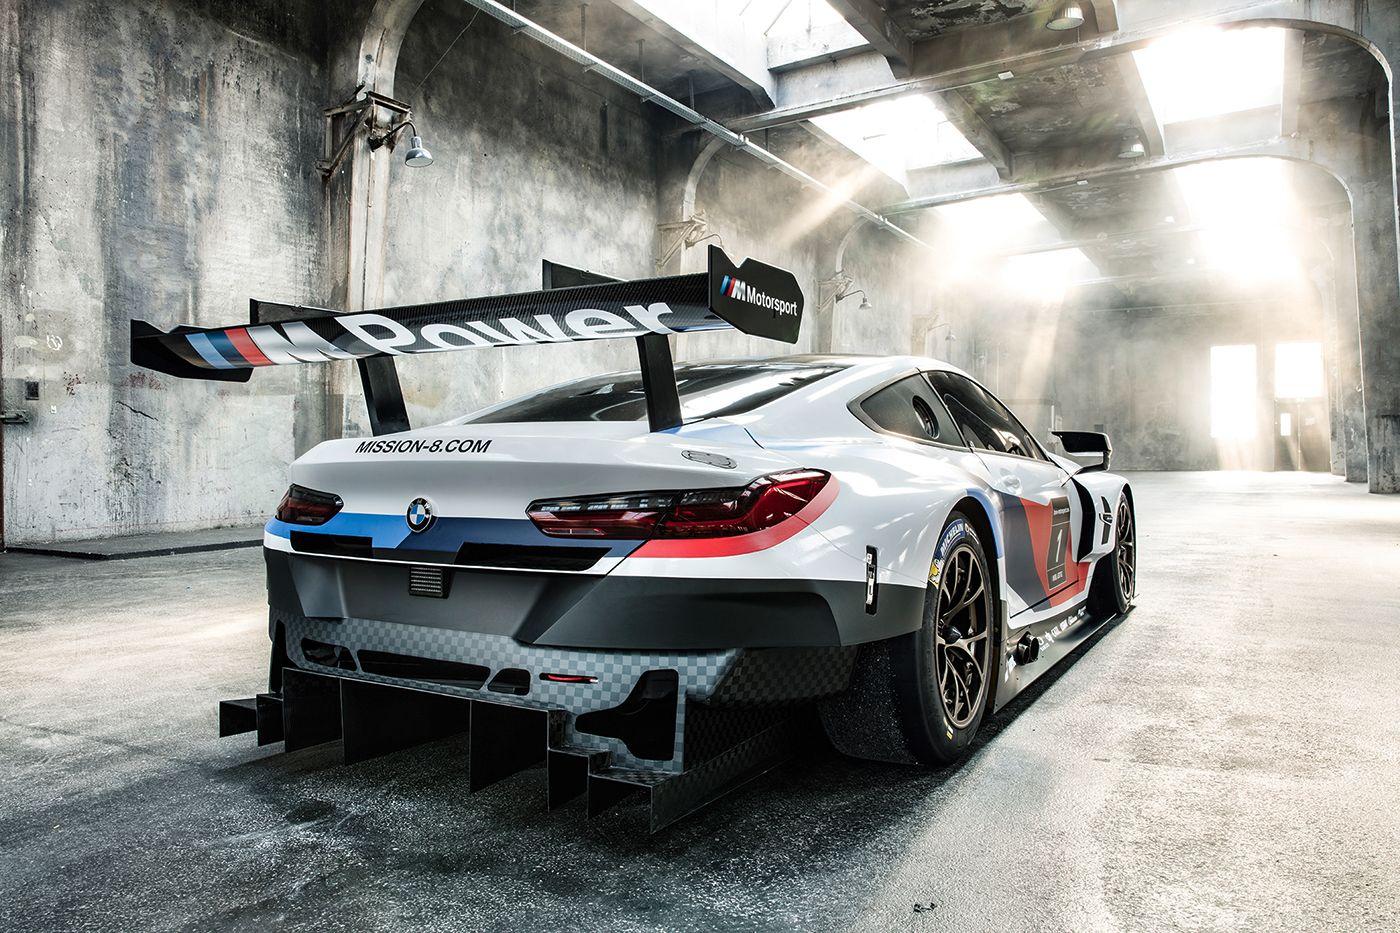 The Bmw M8 Gte Has Huge Kidney Grille Nostrils Bmw Sport Race Cars Bmw Cars